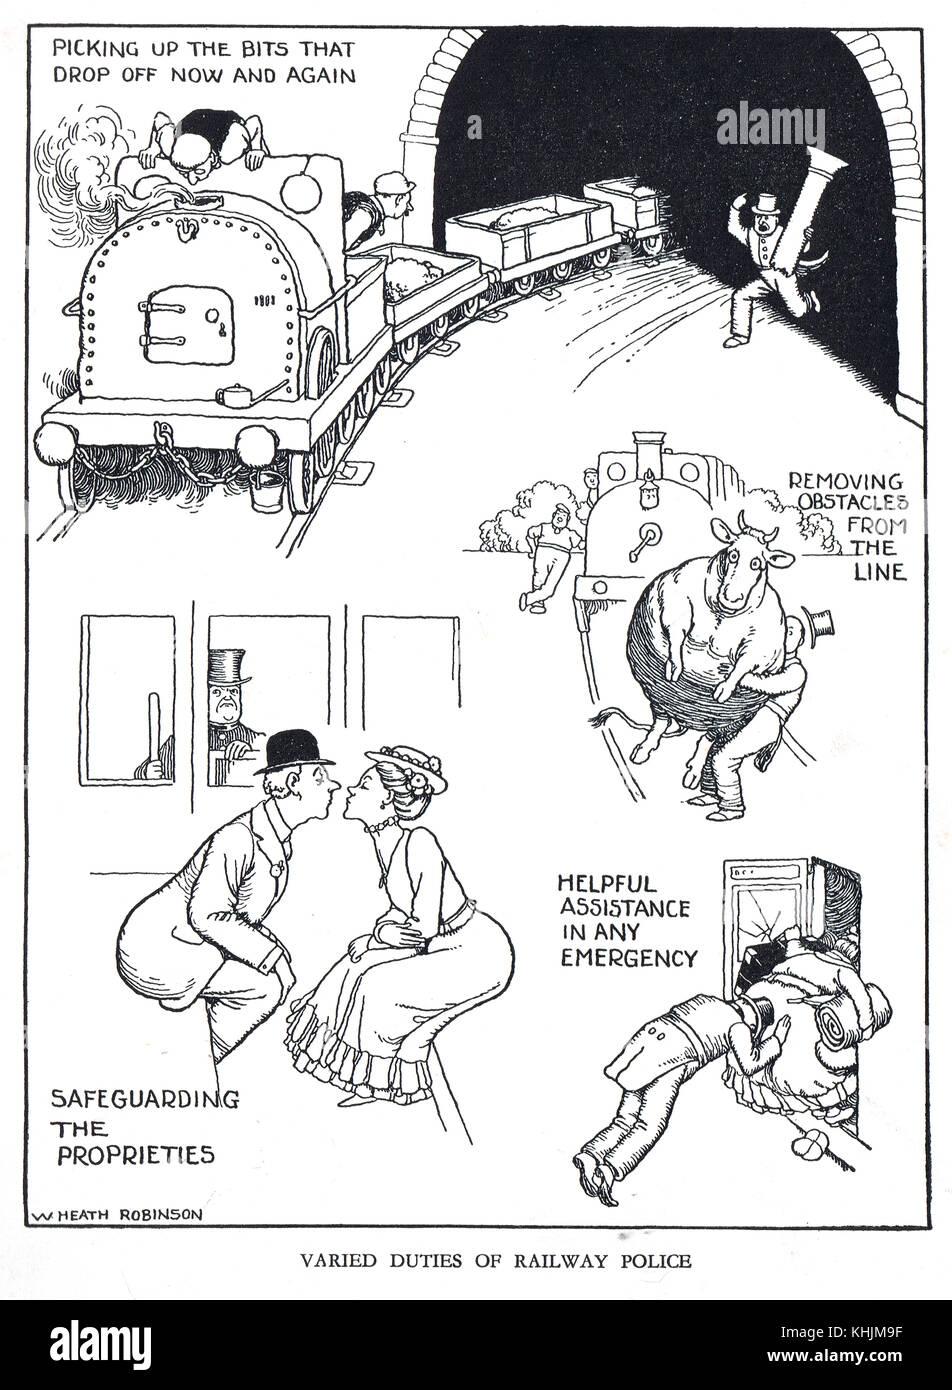 Varied Duties of Railway Police, Cartoon by William Heath Robinson Stock Photo